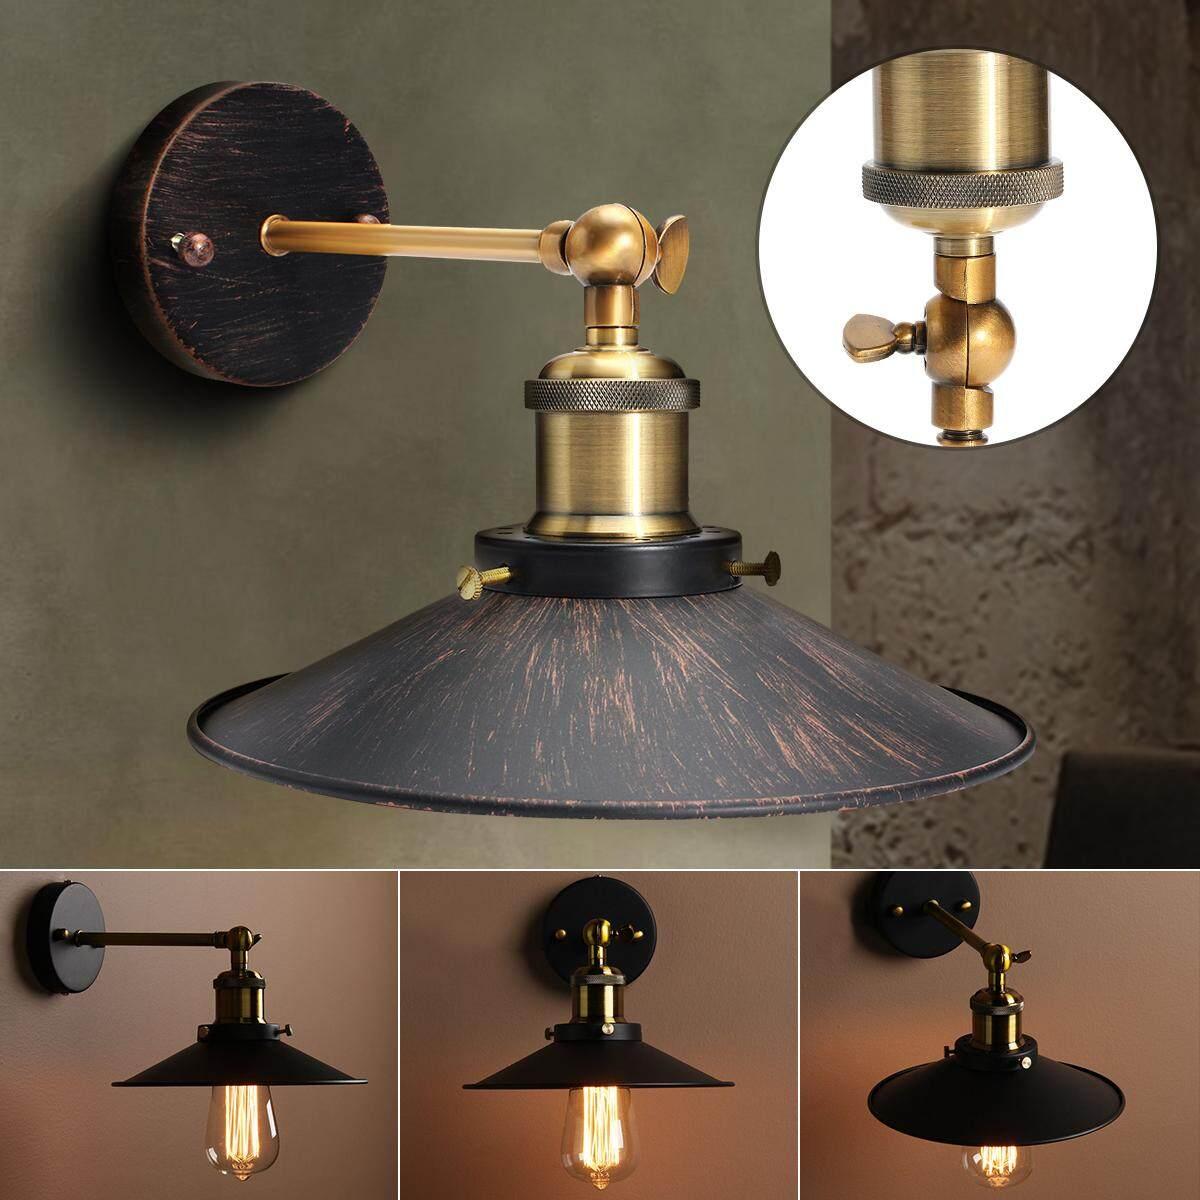 E27 Retro Metal Hanging Lampshade Edison Wall Light Sconce Lamp Holder Socket - intl Singapore